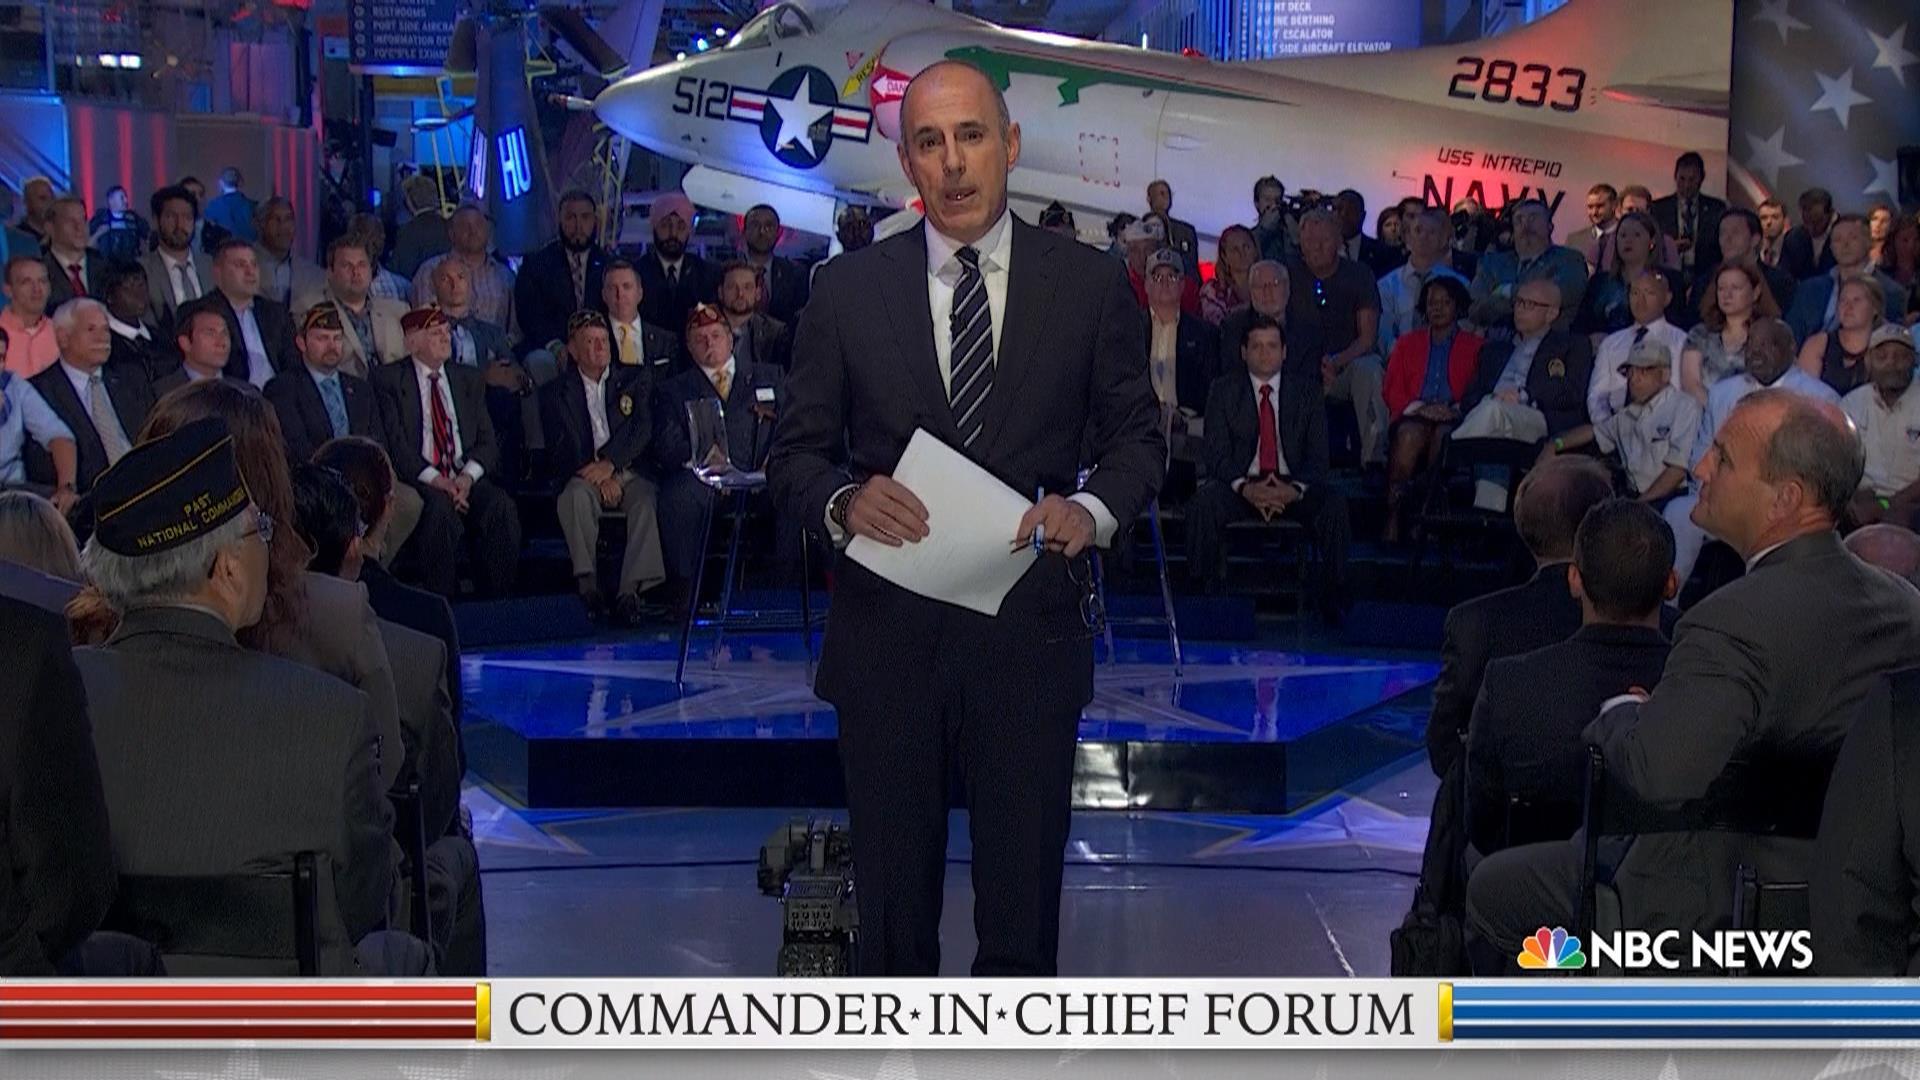 Watch Full Commander-In-Chief Forum